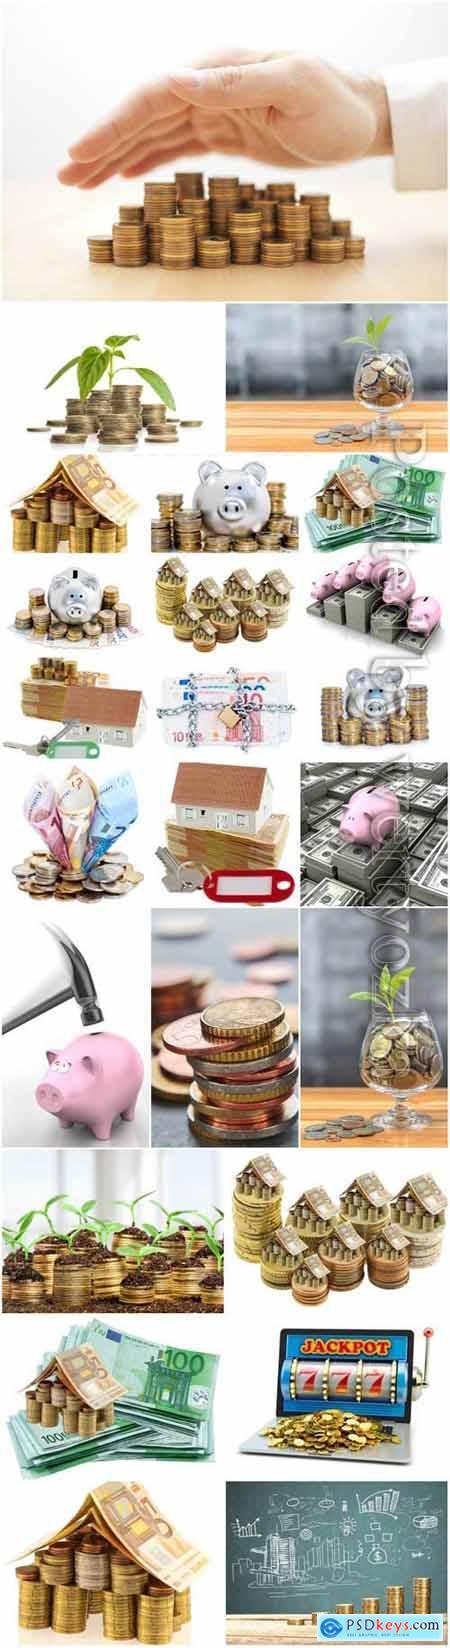 Banknotes, coins stock photo